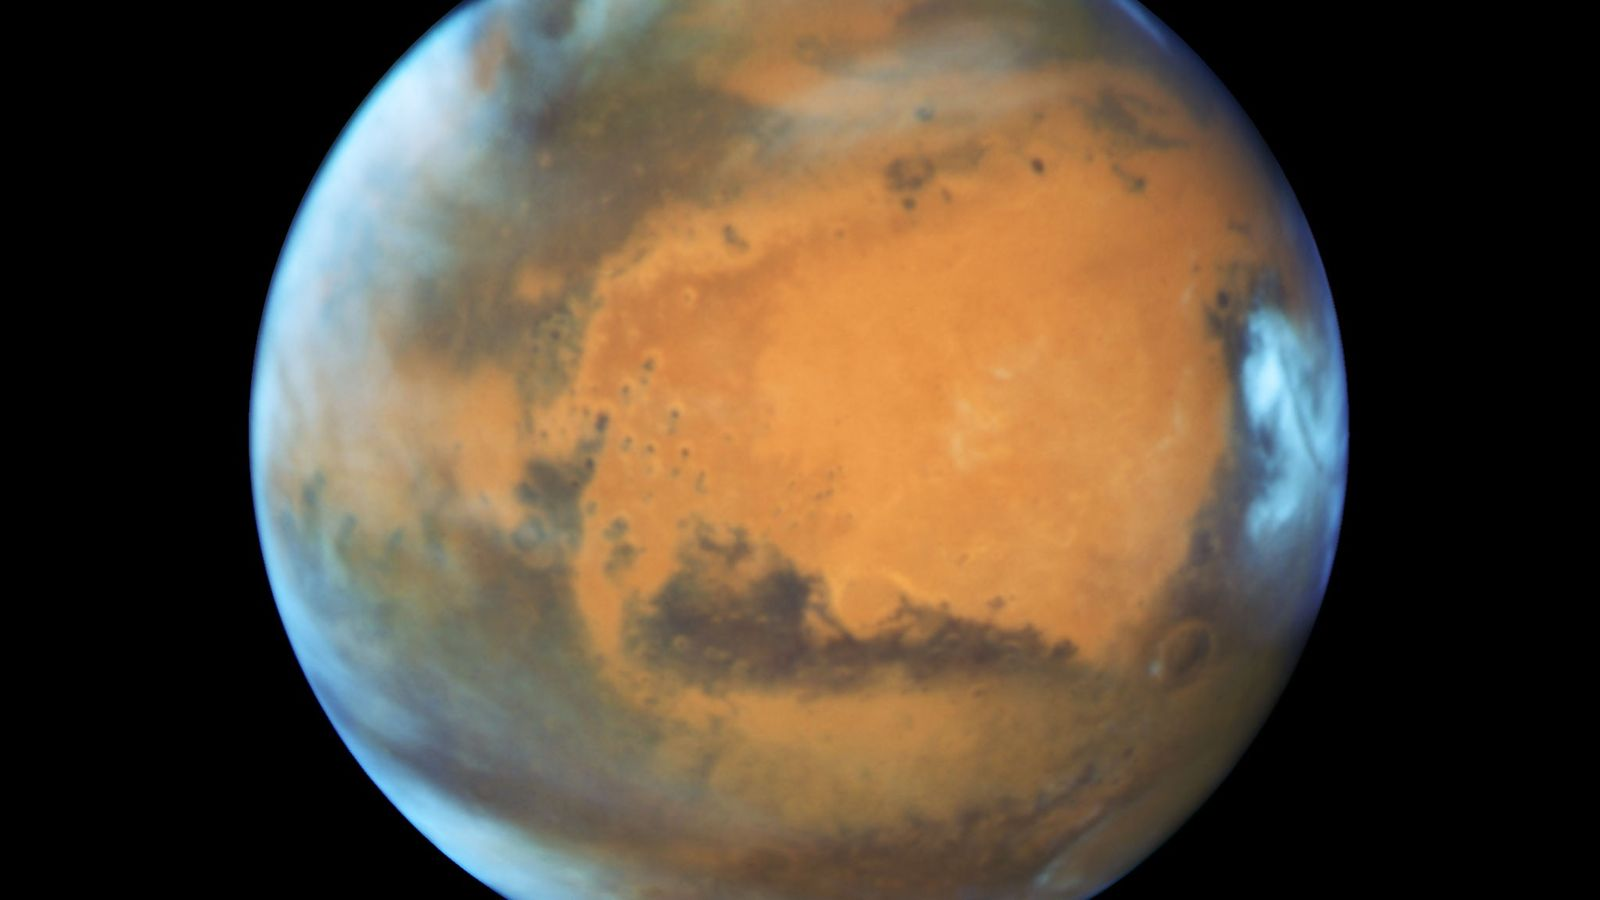 Nahaufnahme des Mars